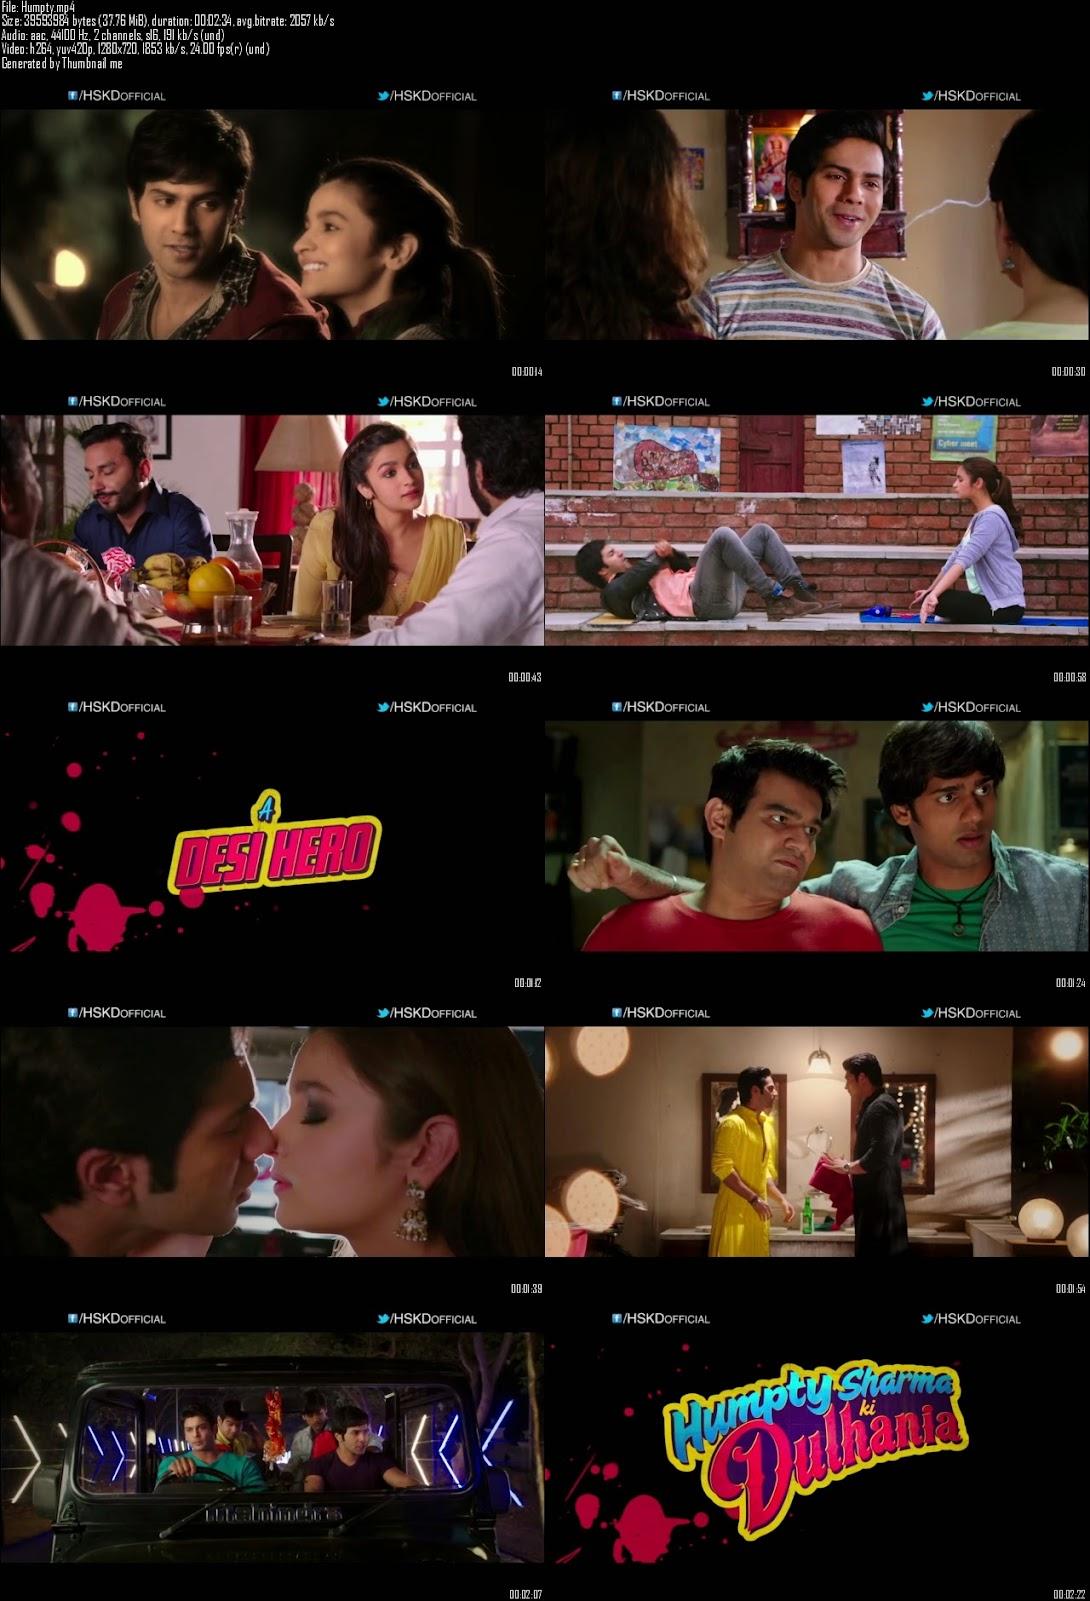 Mediafire Resumable Download Link For Teaser Promo Of Humpty Sharma Ki Dulhania (2014)